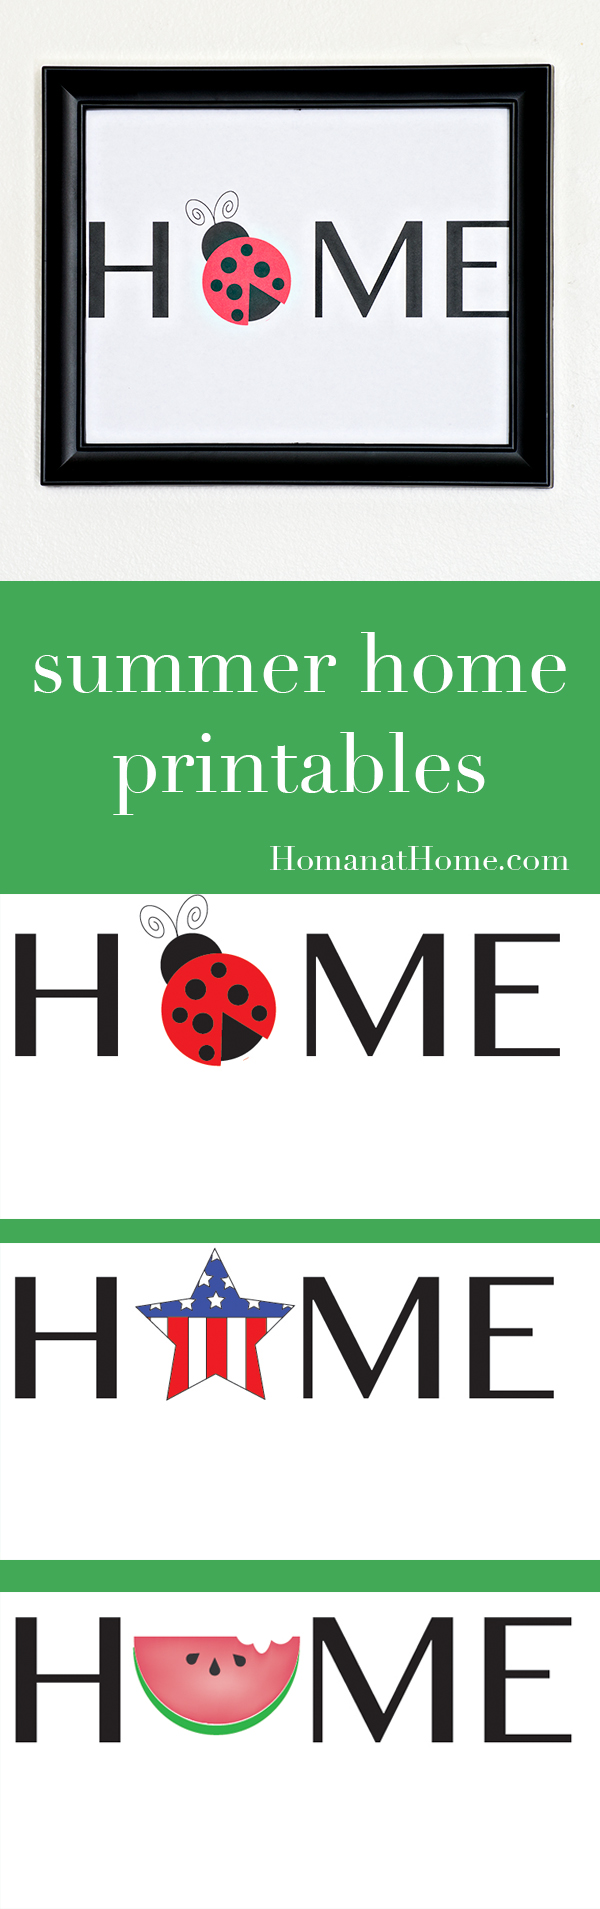 Summer Home Printables | Homan at Home